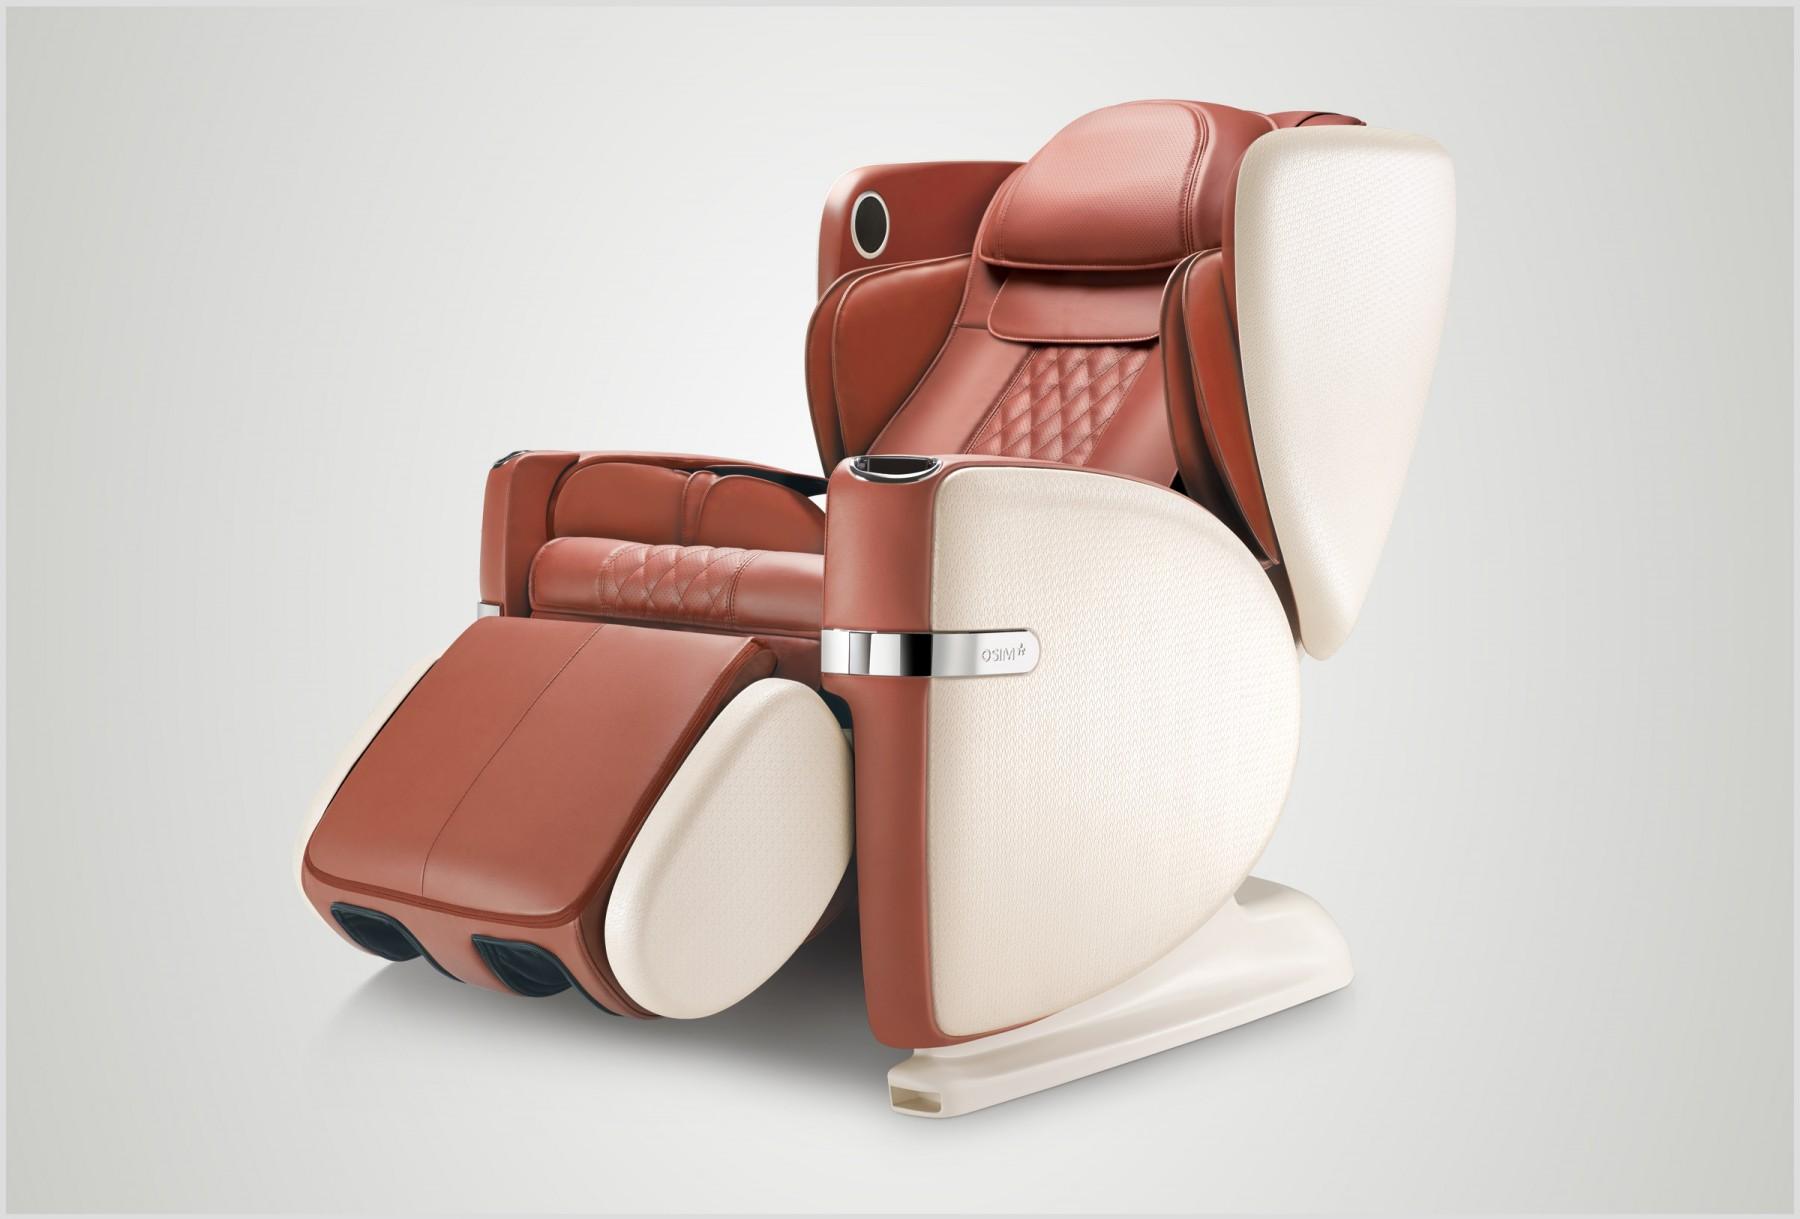 Osim massage chair price - More Views Ulove Massage Chair